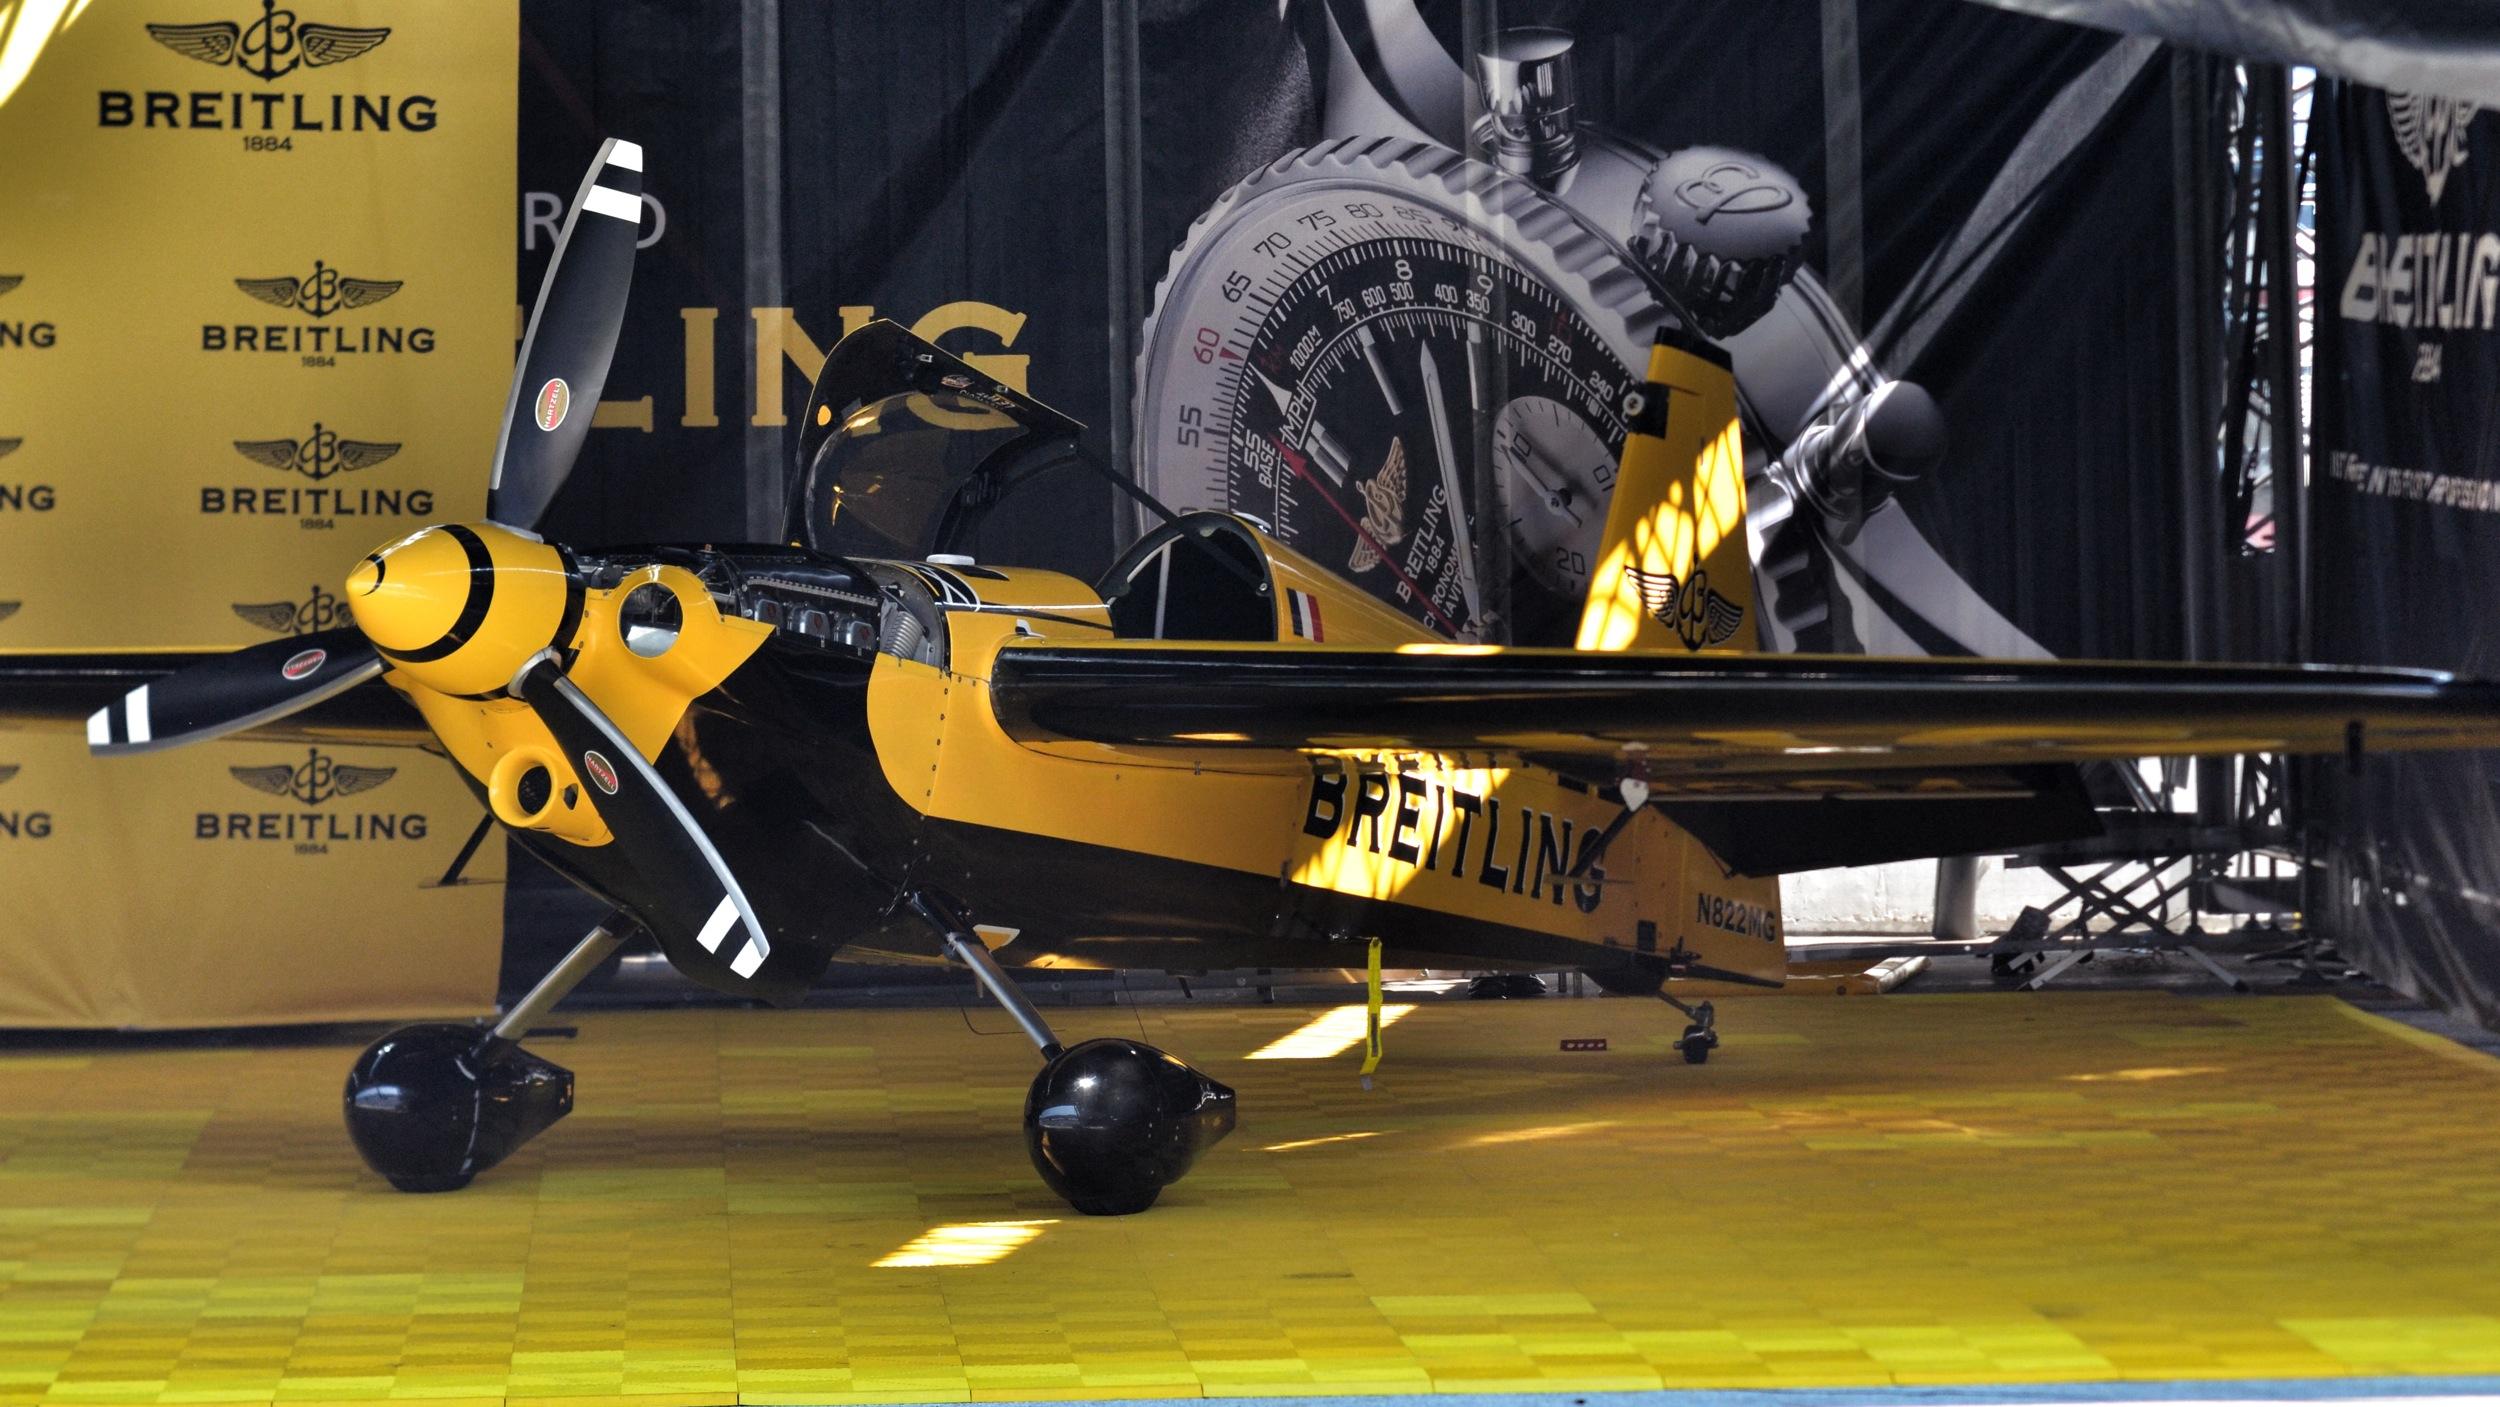 Red Bull Brietling Air Race Aircraft